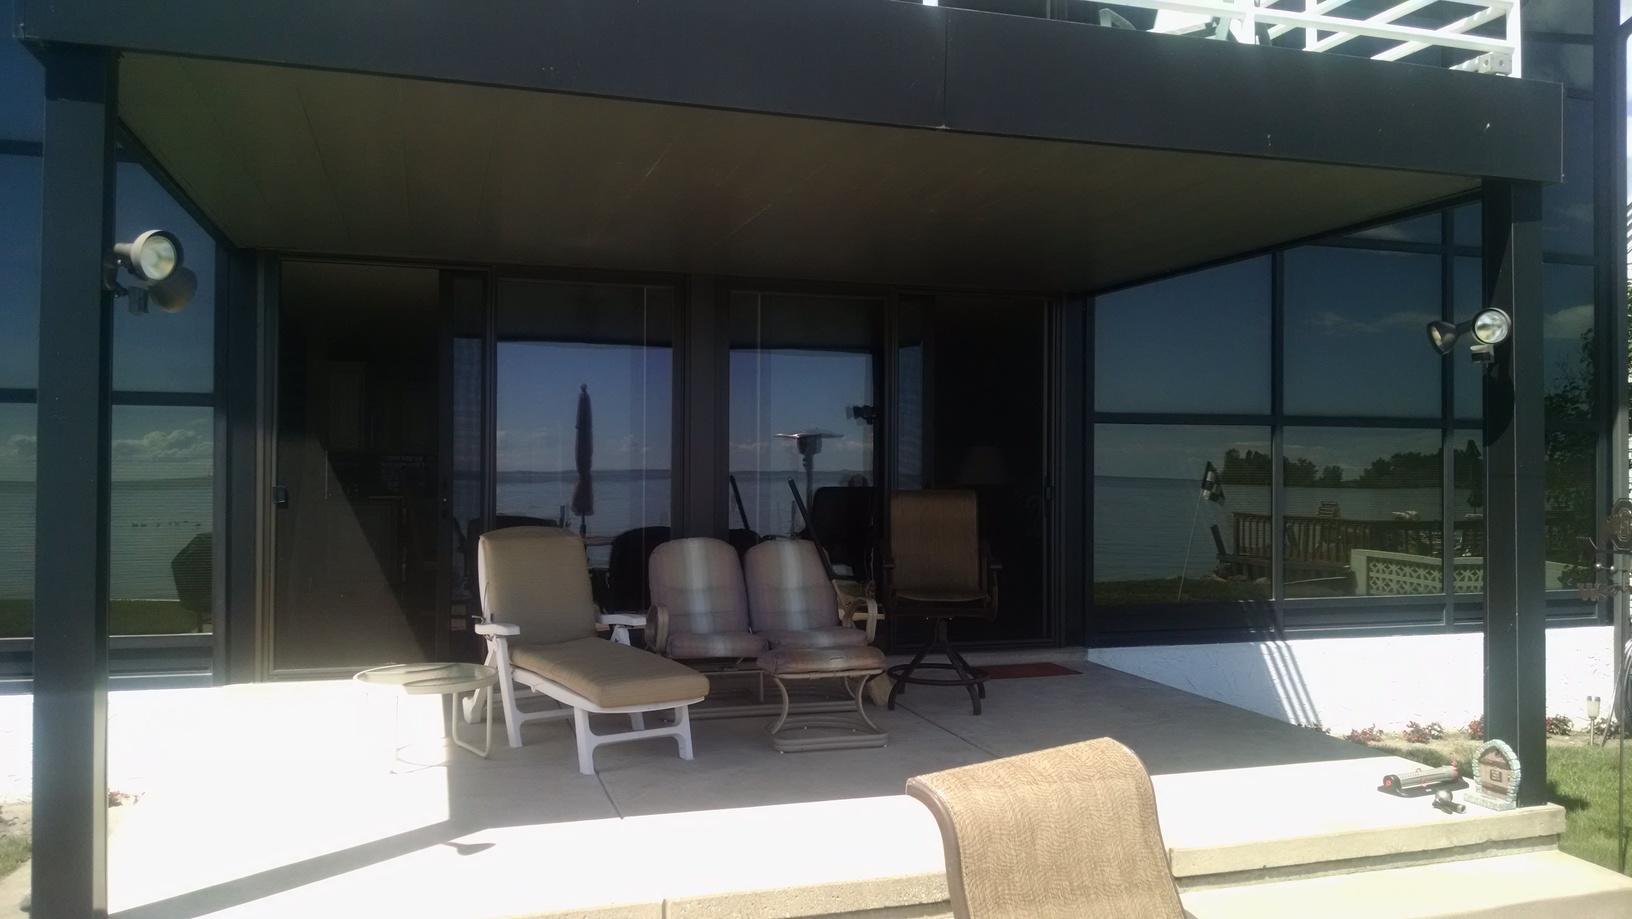 Sunroom Window Installation in Monroe, MI - Before Photo